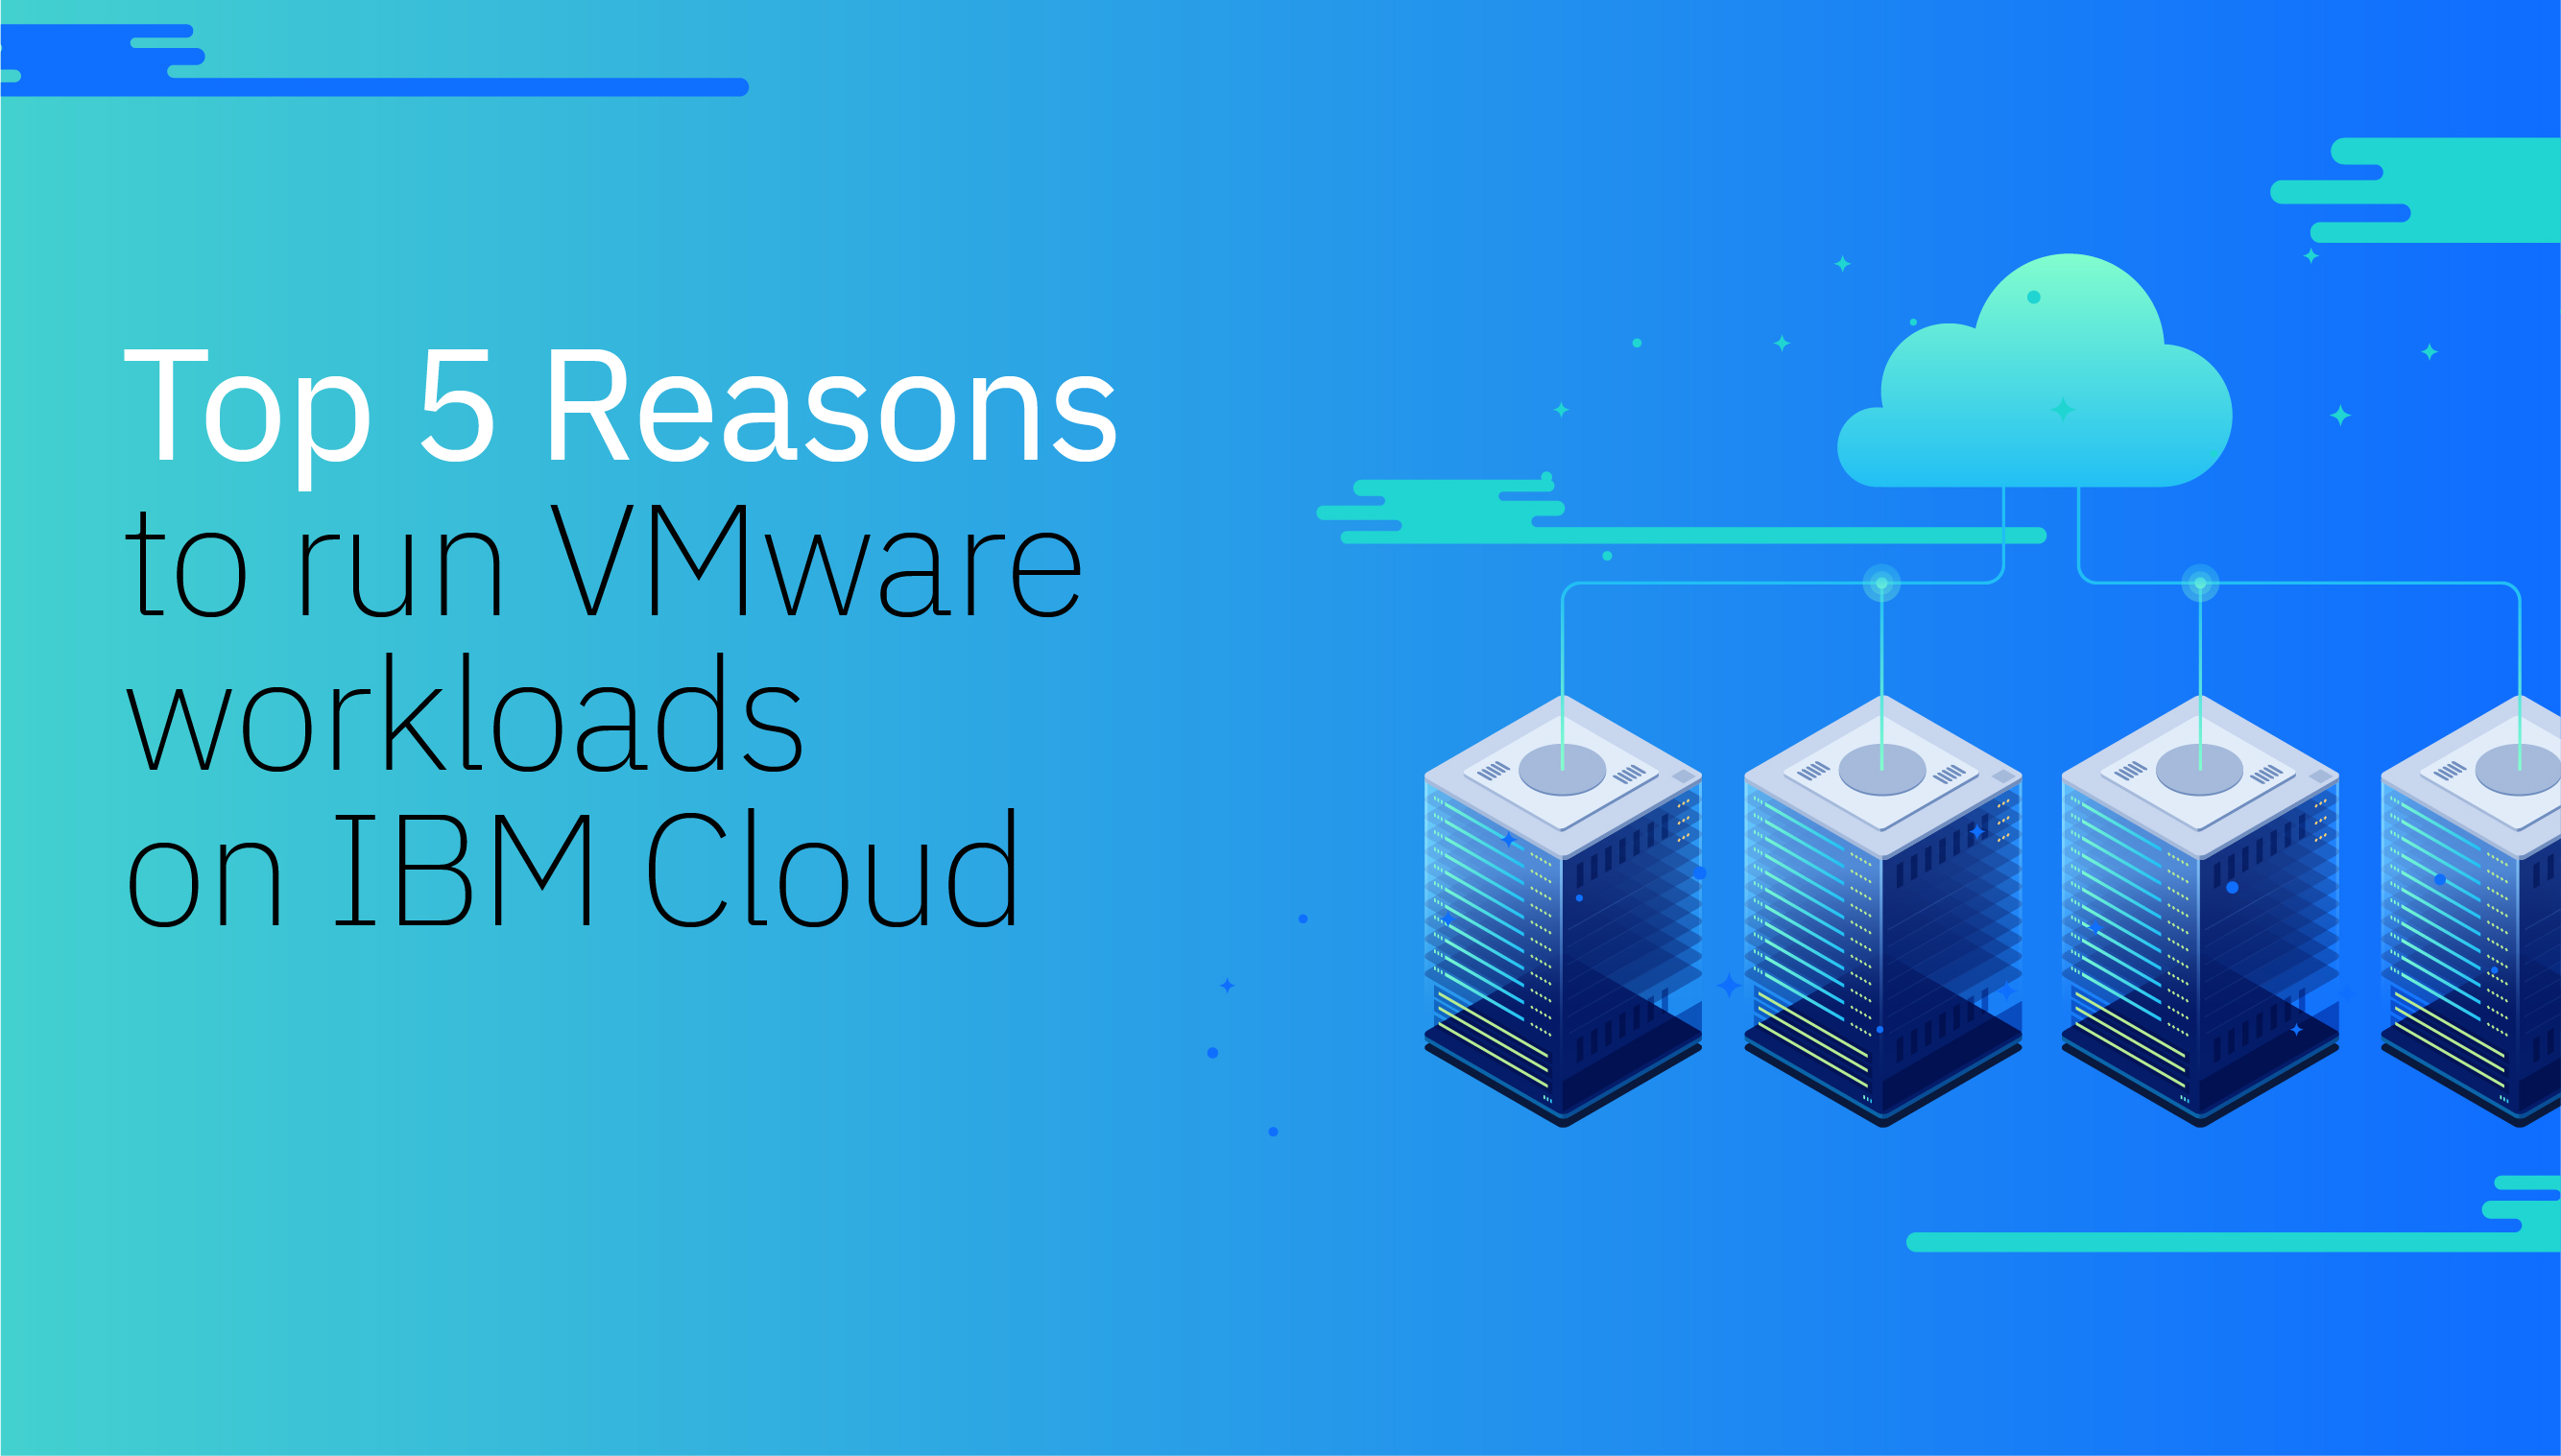 Top 5 Reasons to run VMware workloads on IBM Cloud, Explore